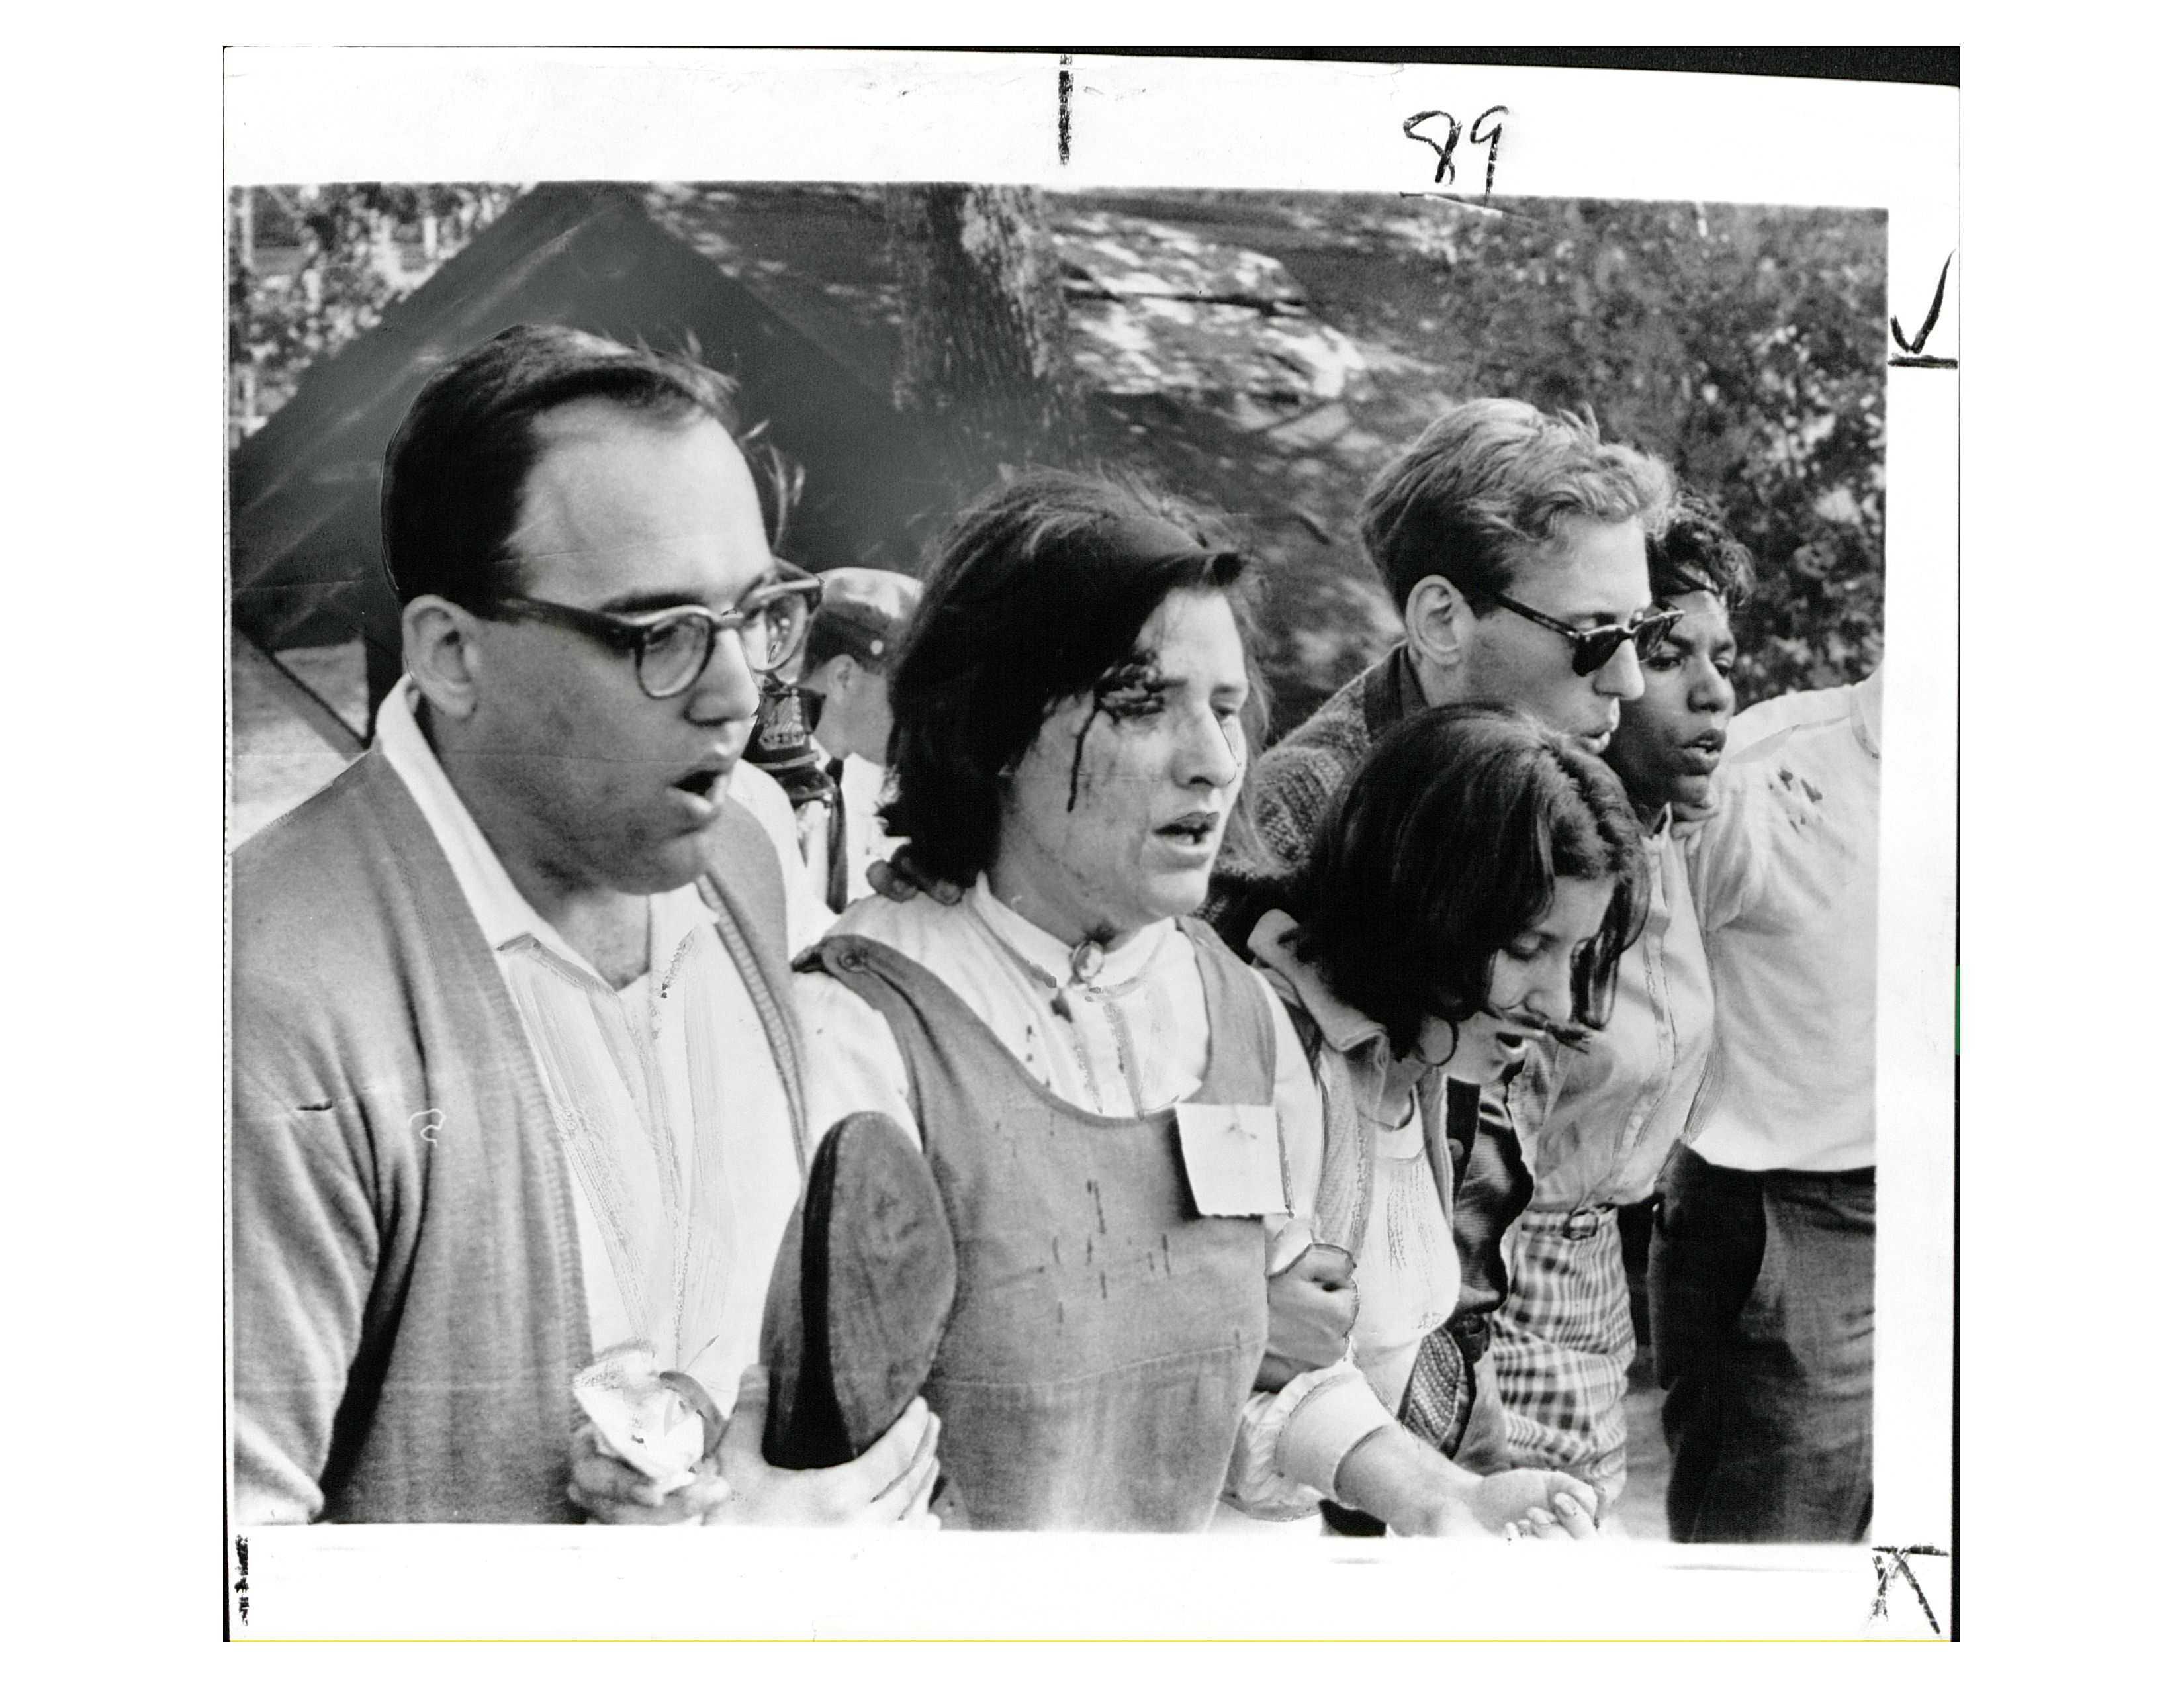 Protesters at Gwynn Oak Amusement Park in July 1963